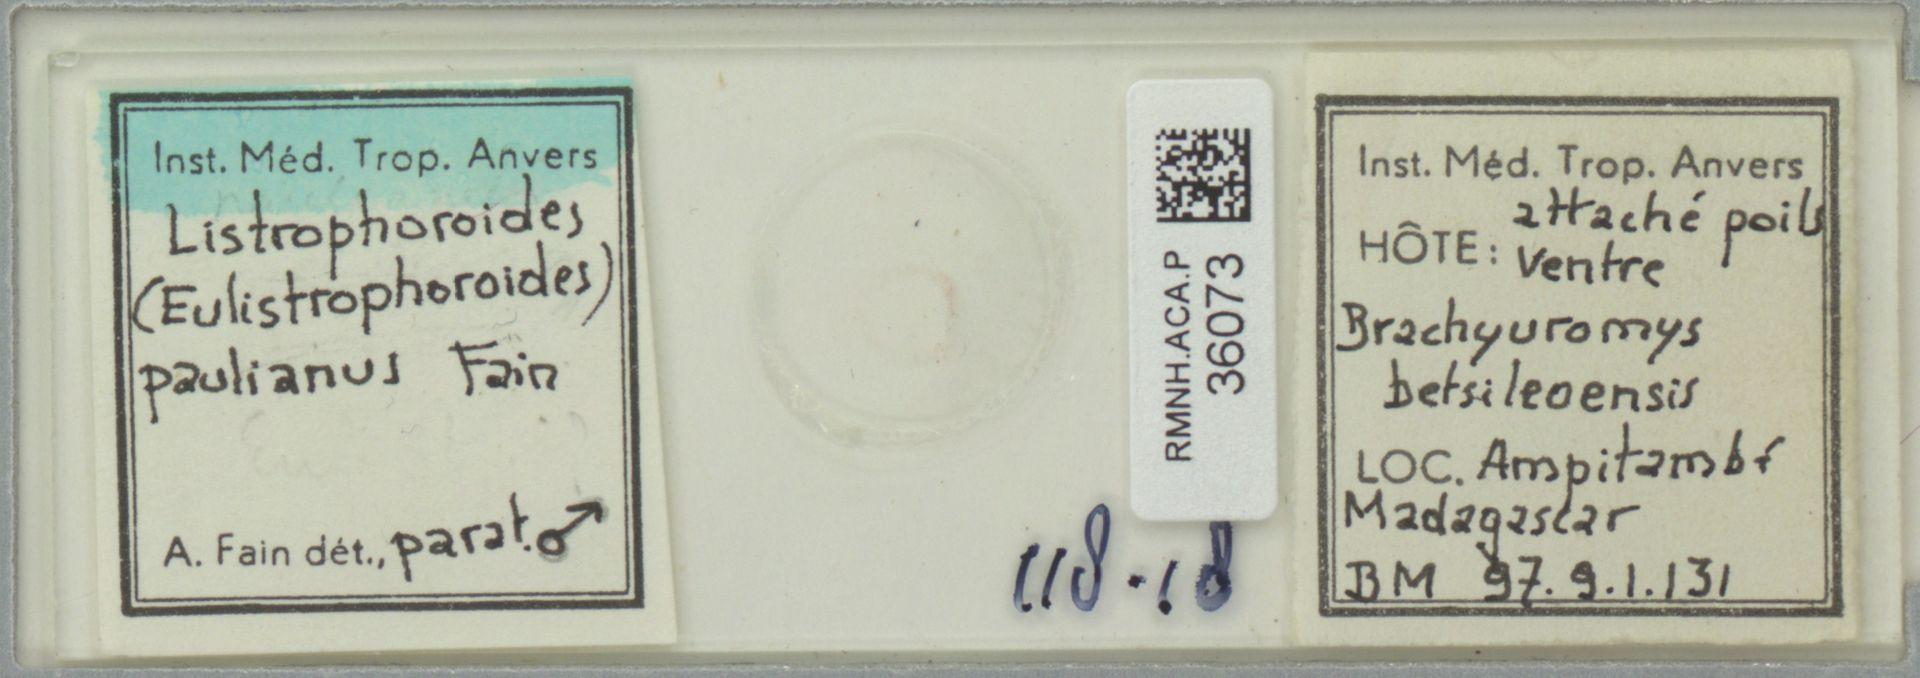 RMNH.ACA.P.36073 | Listrophoroides (Eulistrophoroides) paulianus Fain